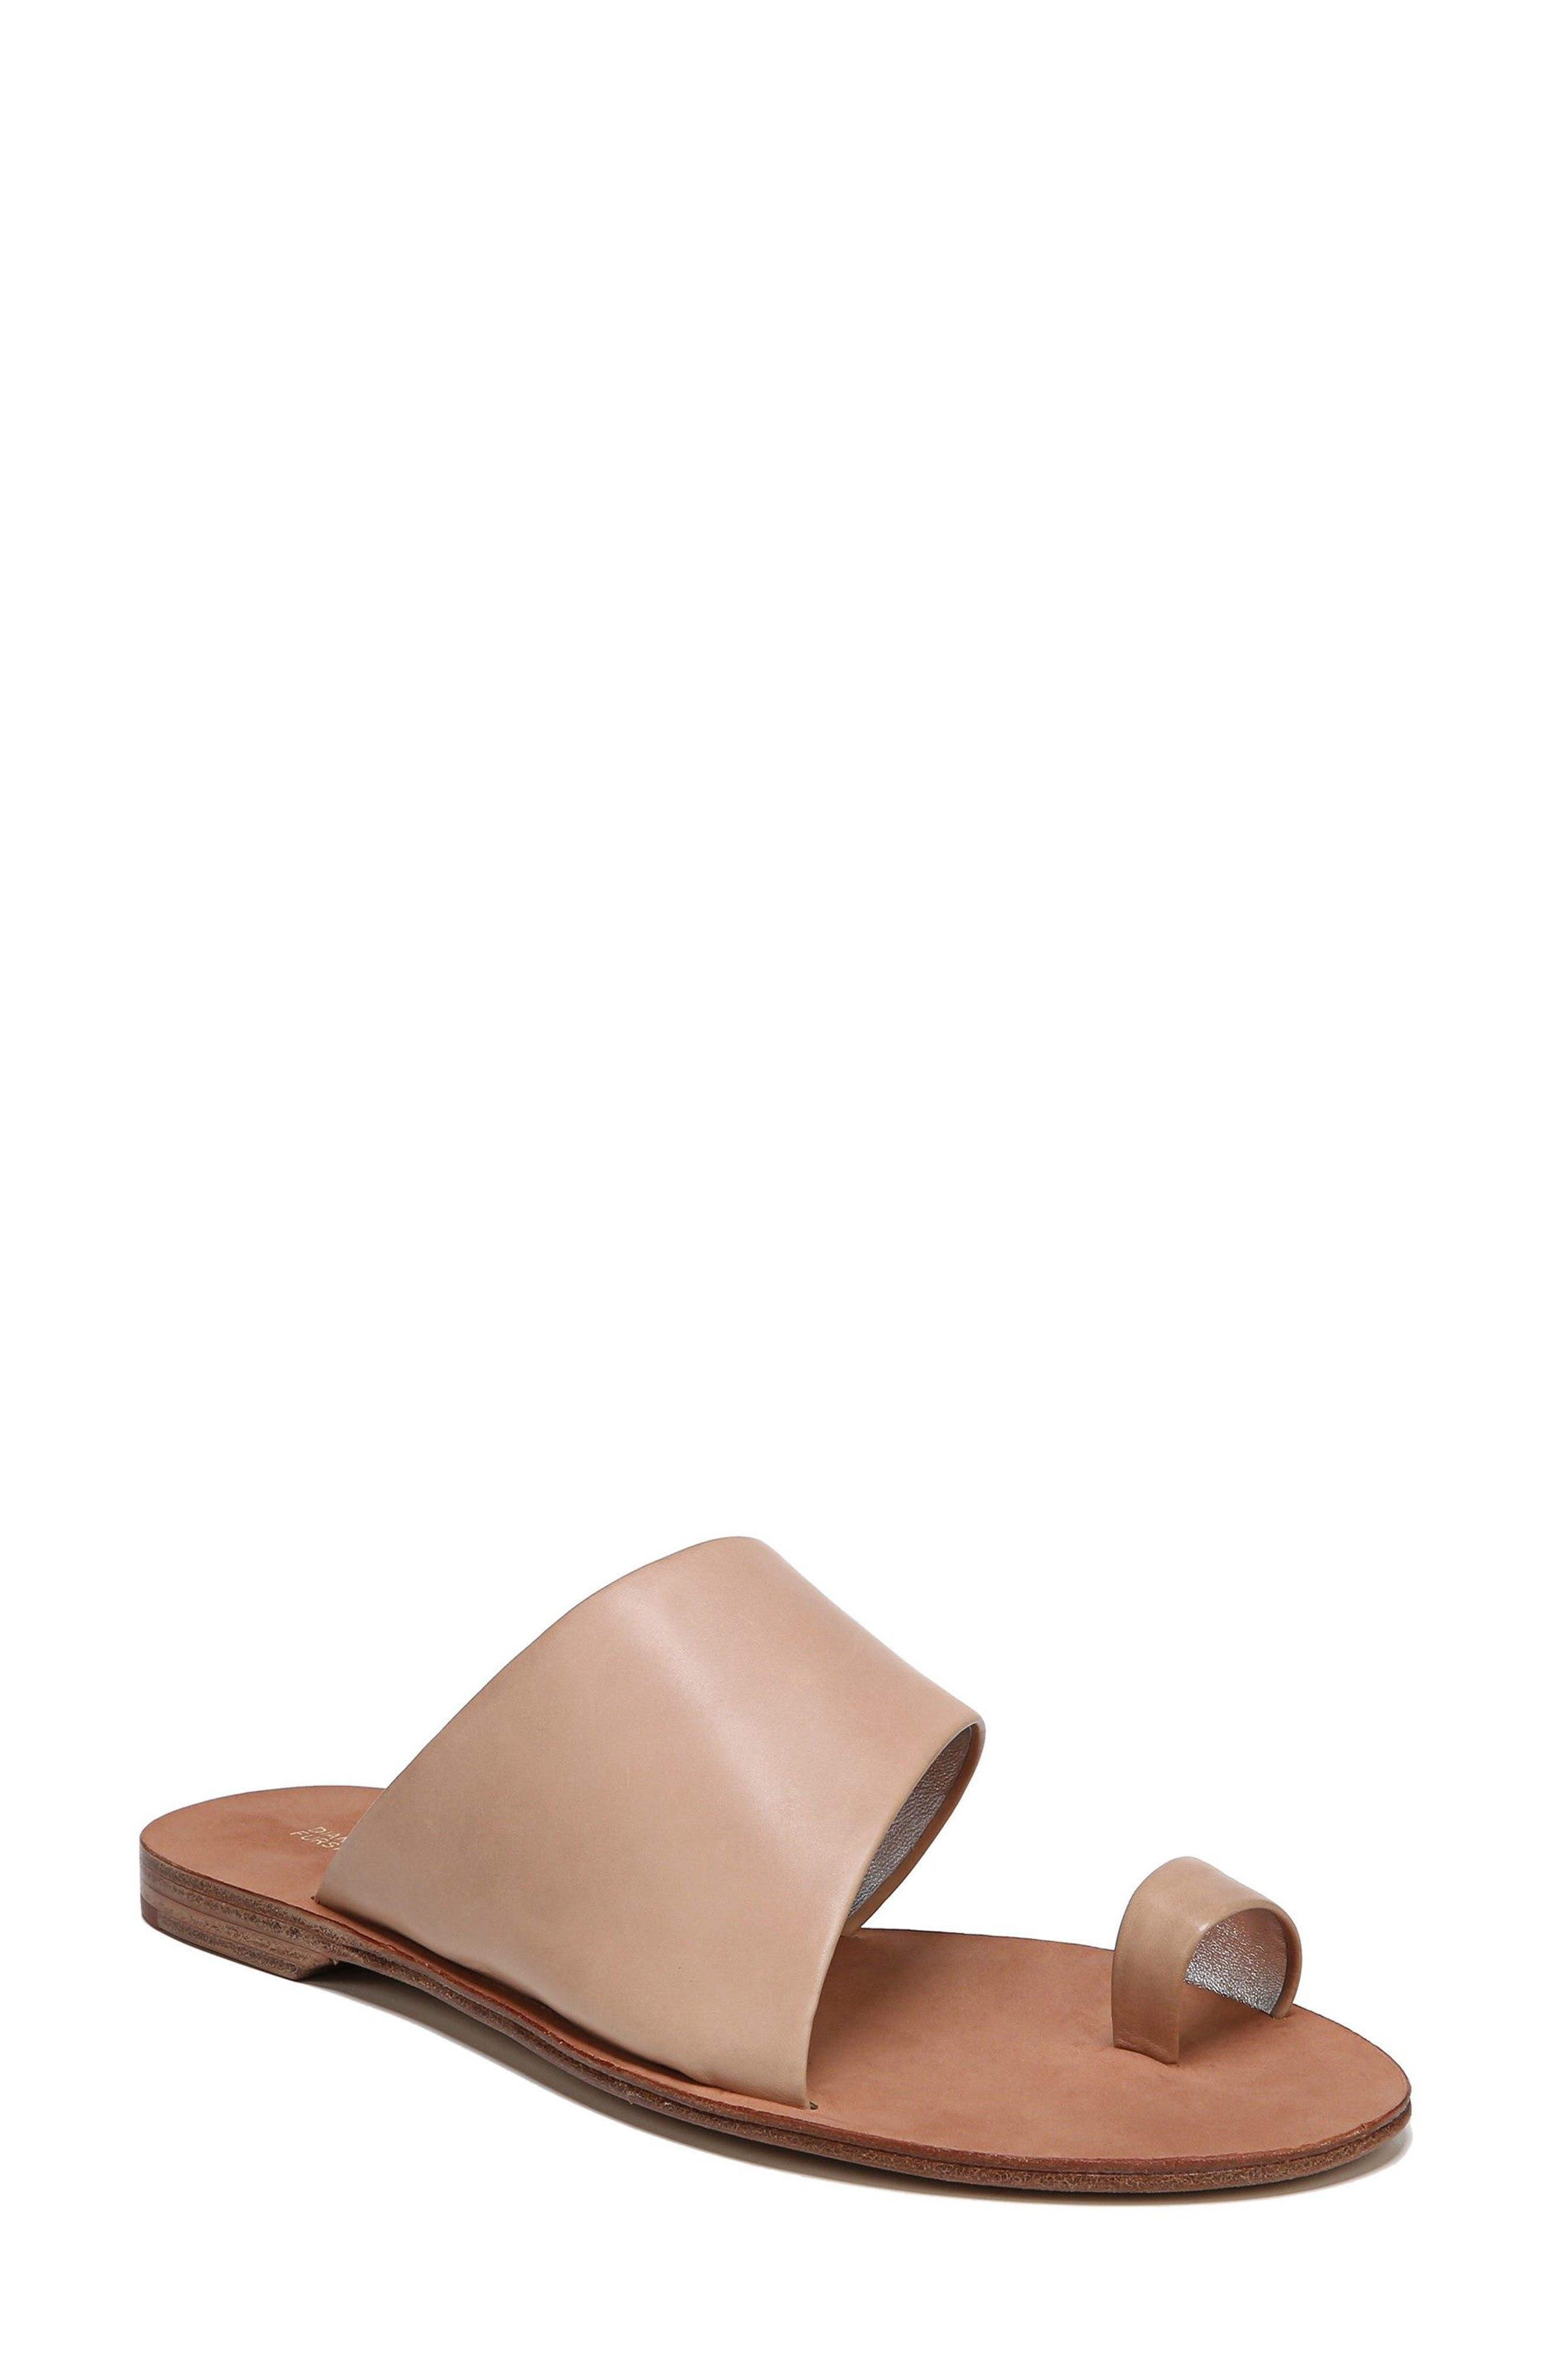 Brittany Asymmetrical Flat Sandal,                         Main,                         color, 202